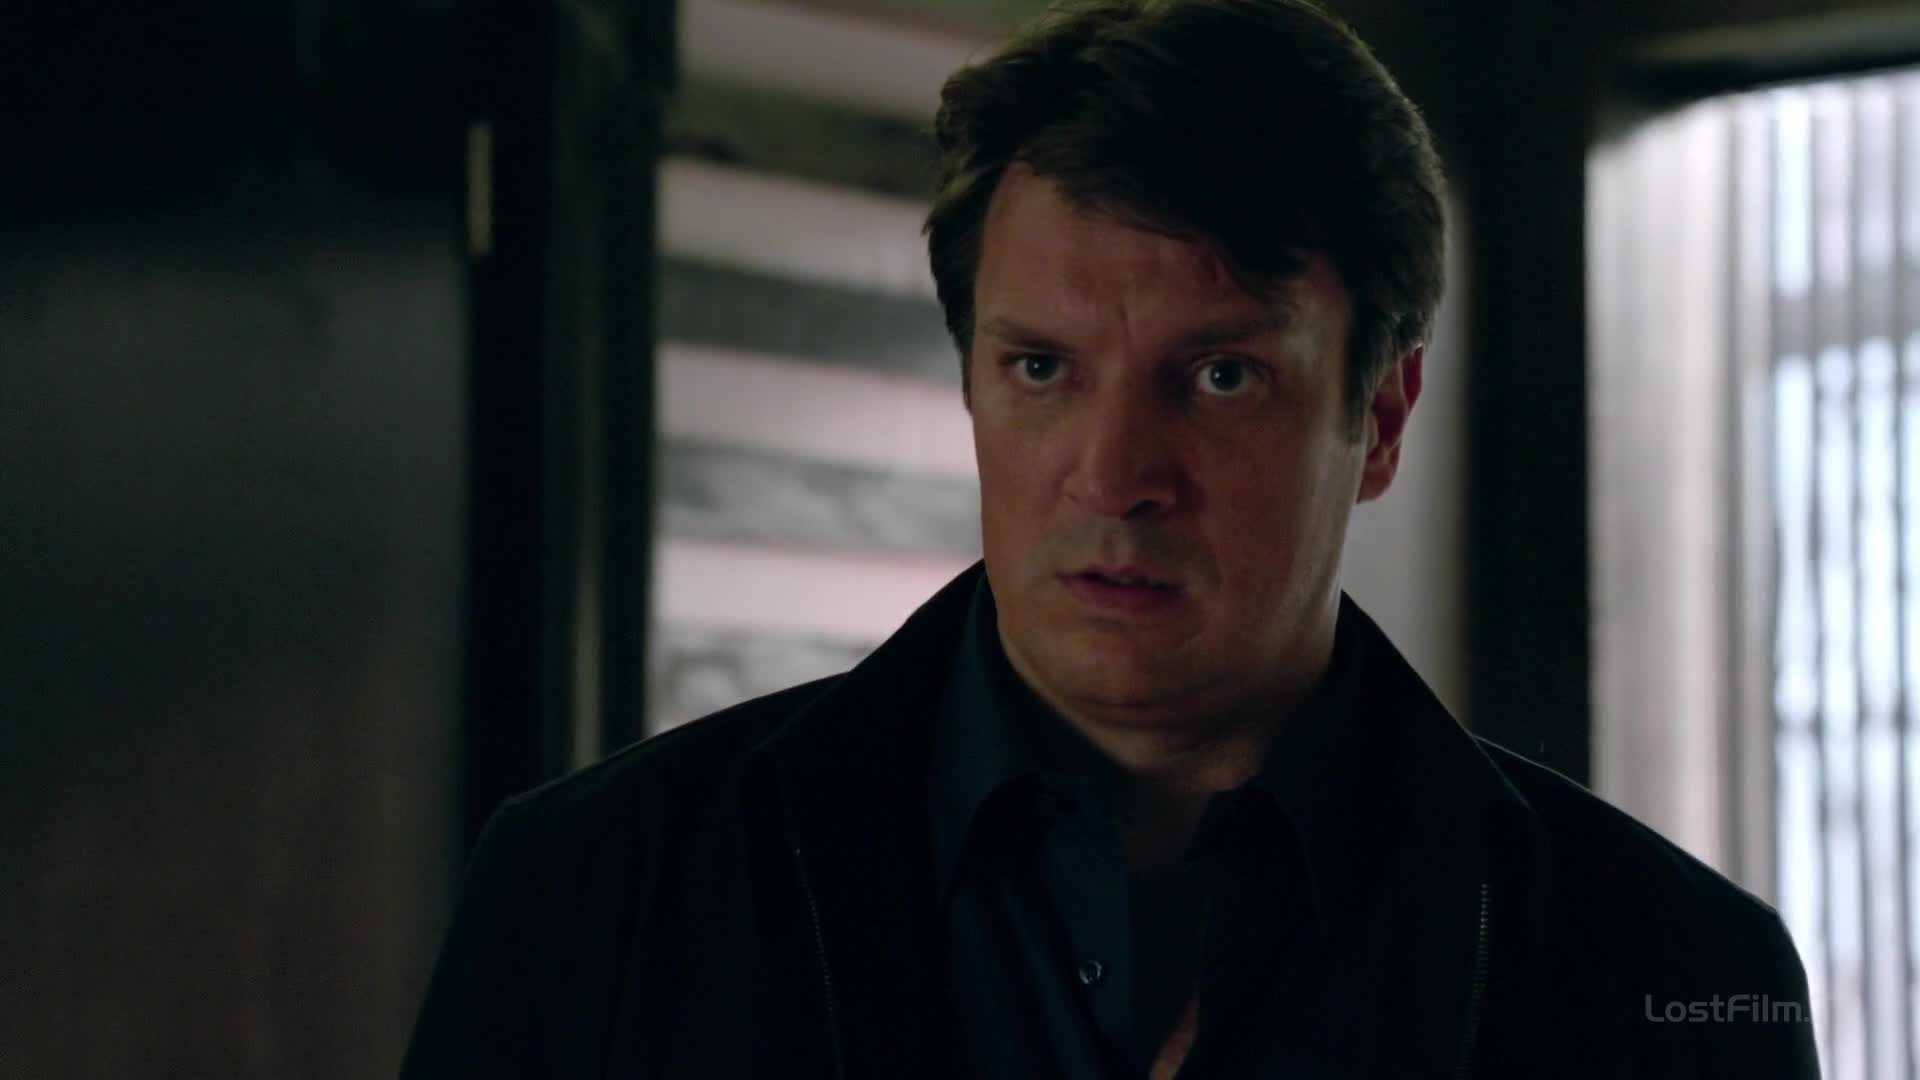 Касл (8 сезон: 1-22 серии из 22) (2015) WEB-DLRip 1080p | LostFilm